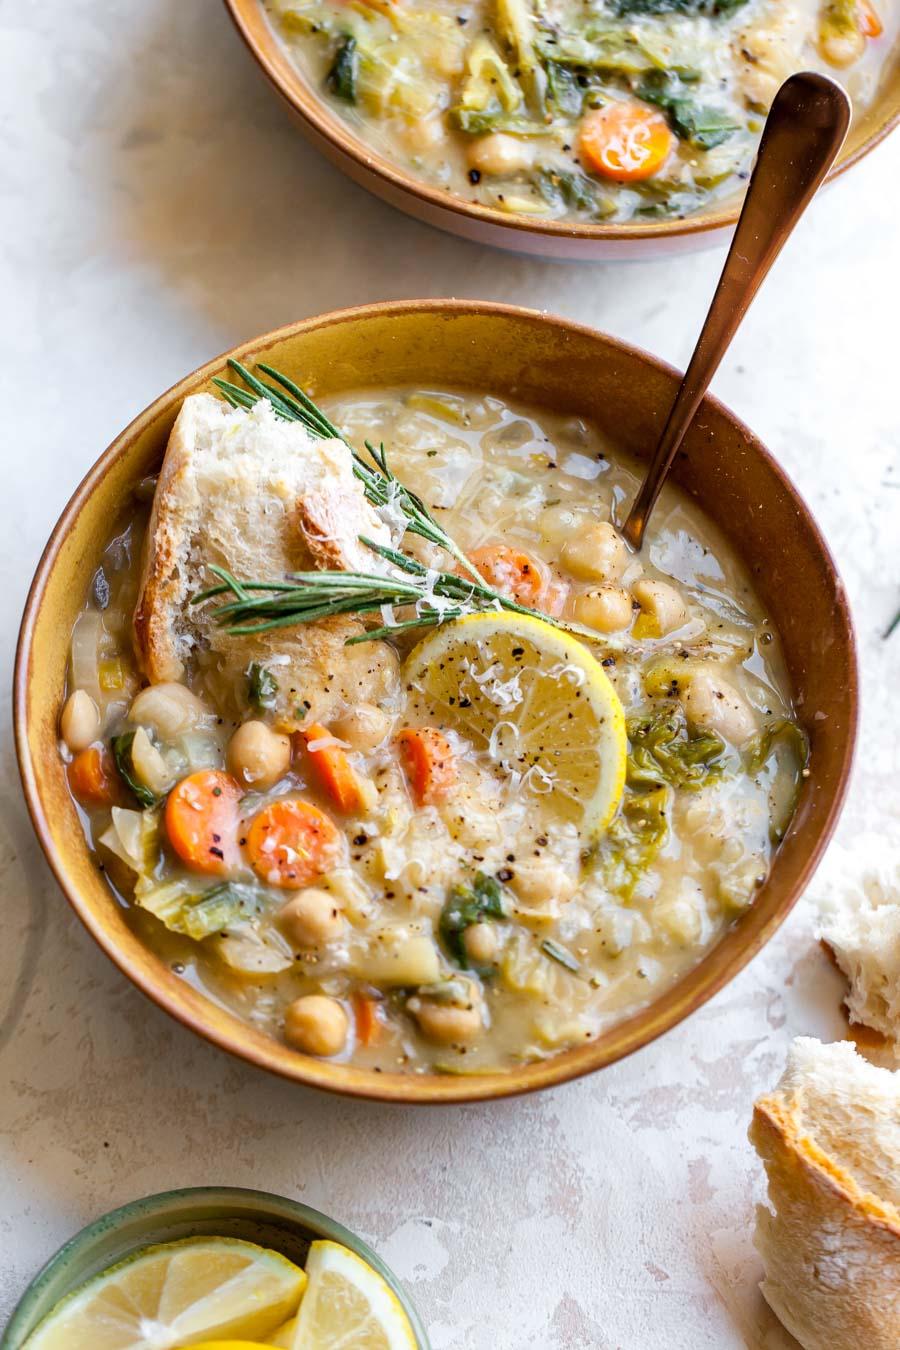 Nourishing Vegetarian White Bean Stew with Lemon, Parmesan, and Rosemary